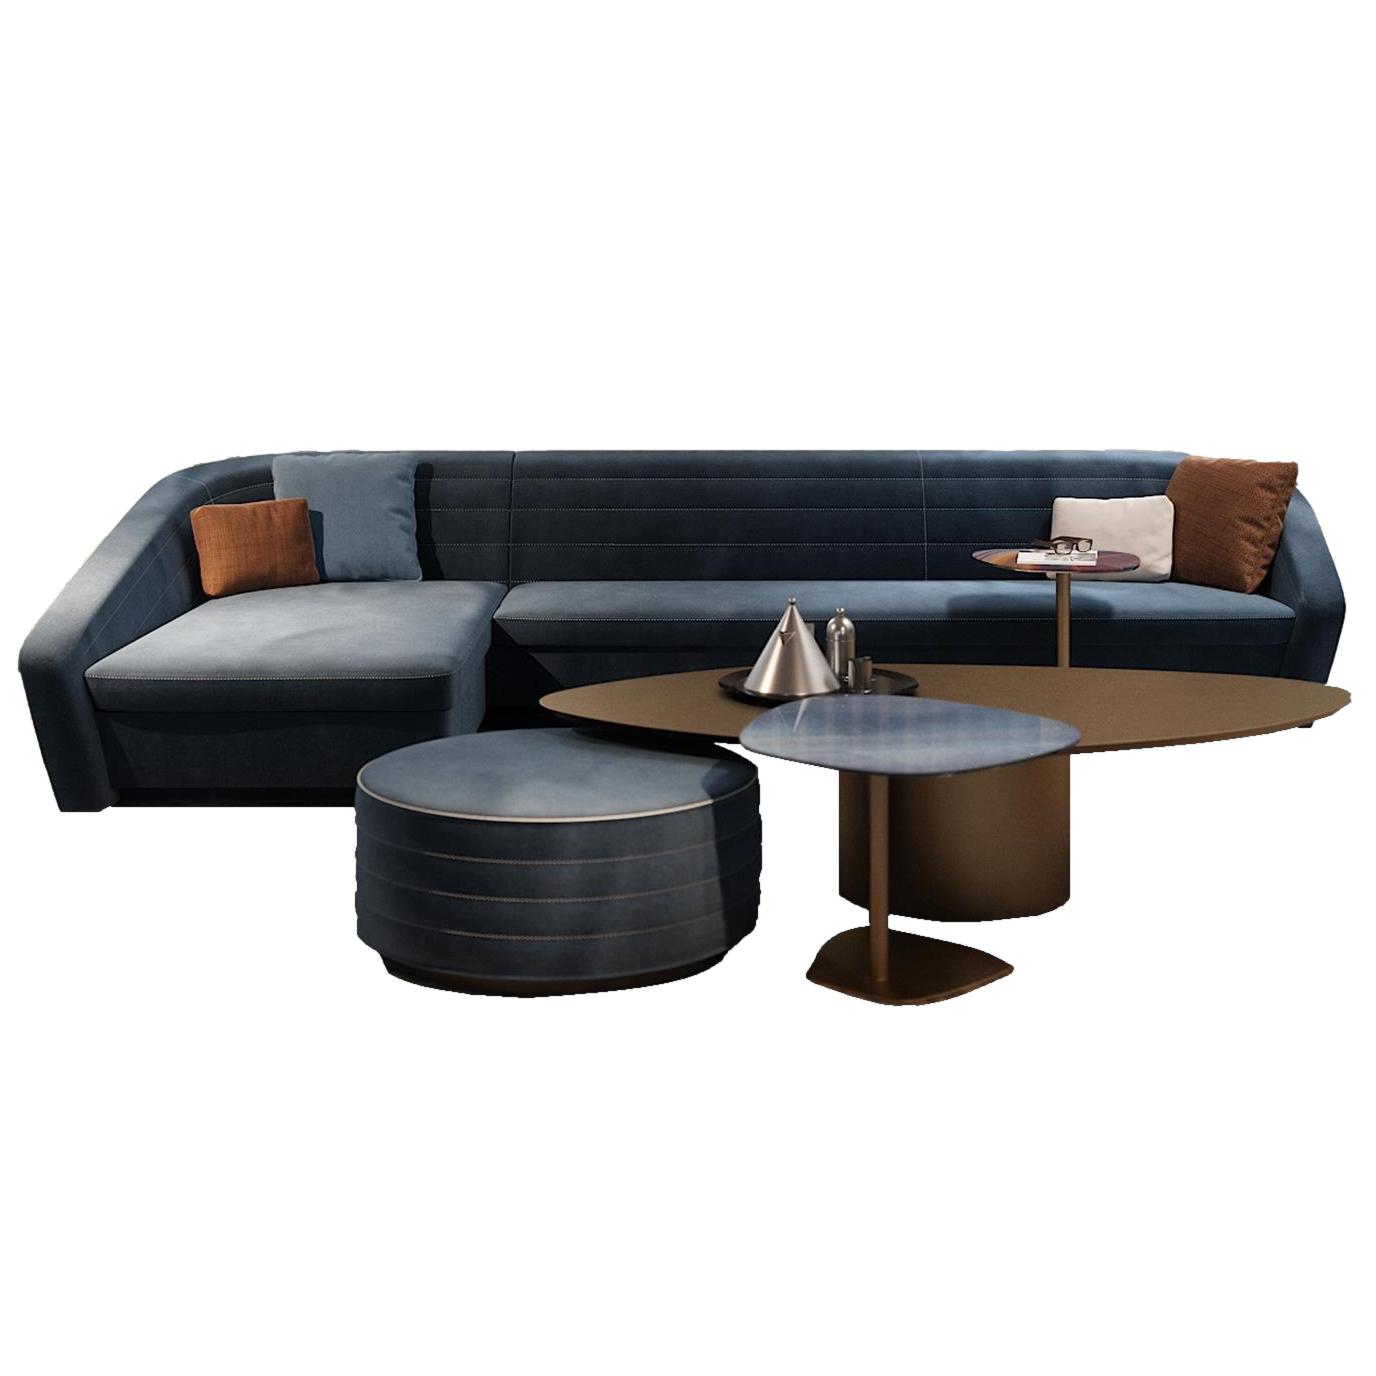 luxury furniture stores calgary sofas armchairs granturismo sofa pininfarina reflex luxuries of europe